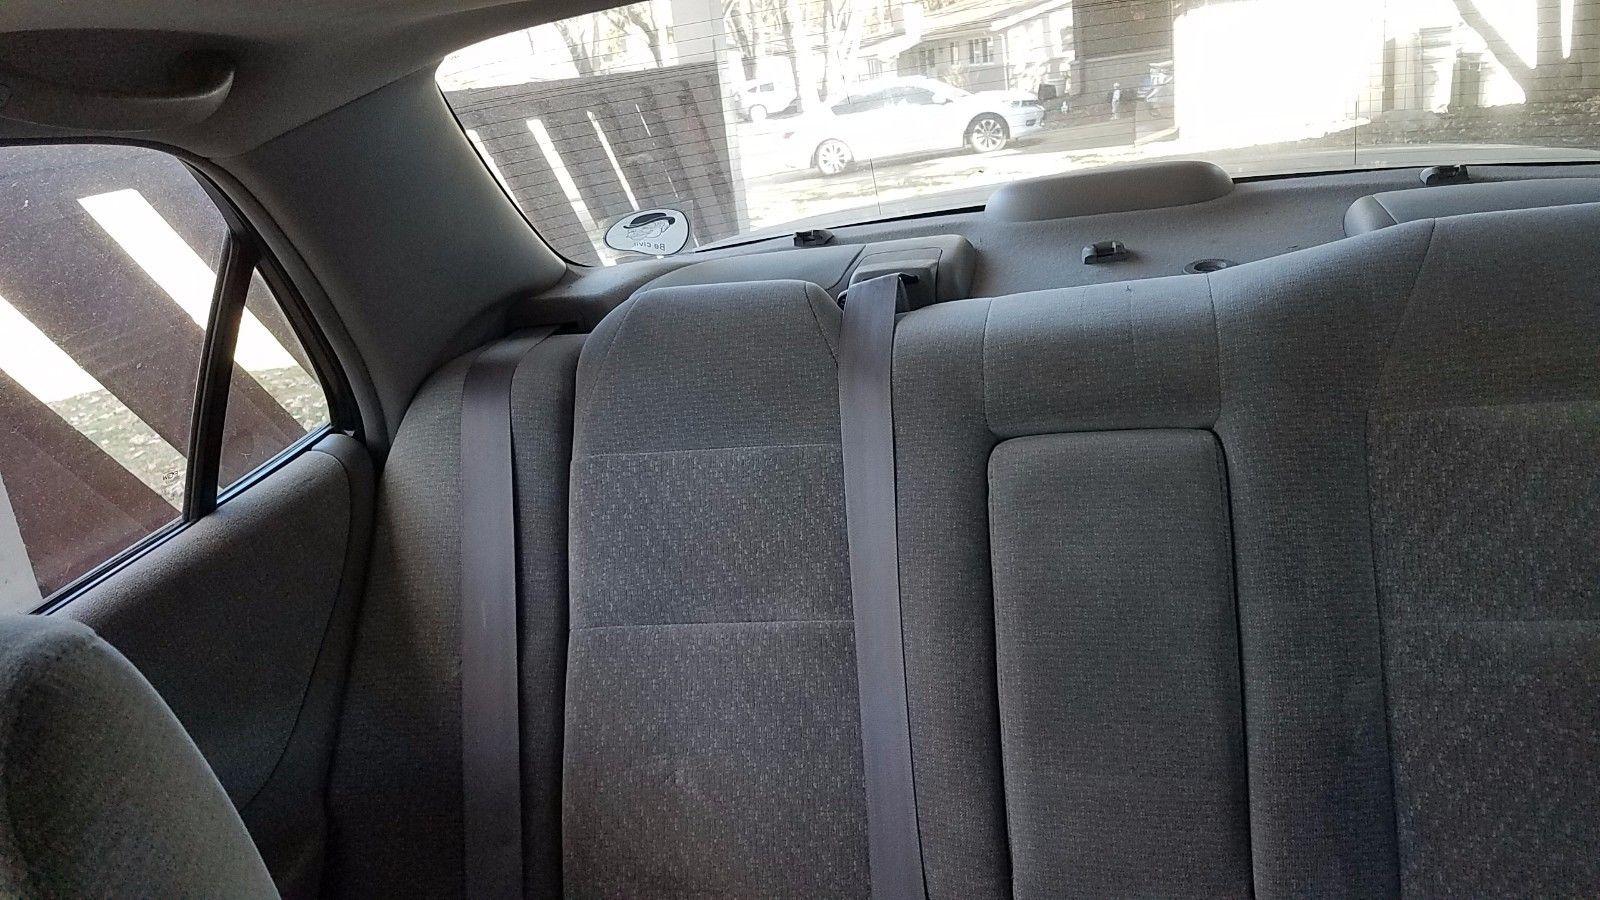 Awesome 2002 Honda Accord SE Sedan 4-Door 2002 Honda Accord SE 4-Door MP3 hookup – HID Headlights – New oil and filter 2017 2018